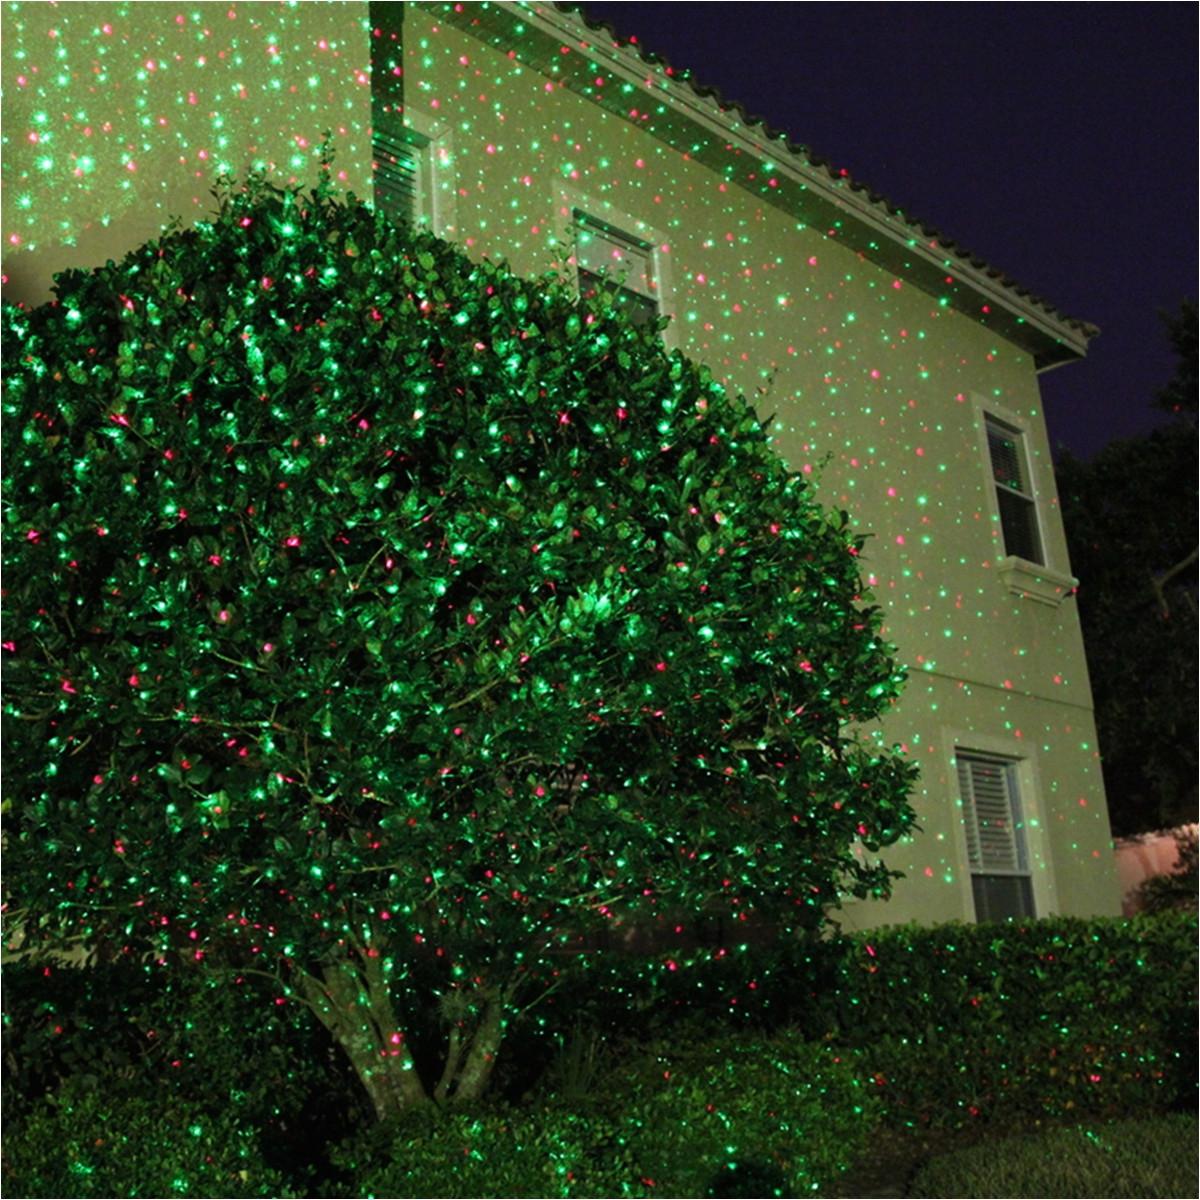 floureona outdoor red green auto dynamic firefly laser projector laser lawn light built in light sensor ip65 waterproof for patio lawn garden